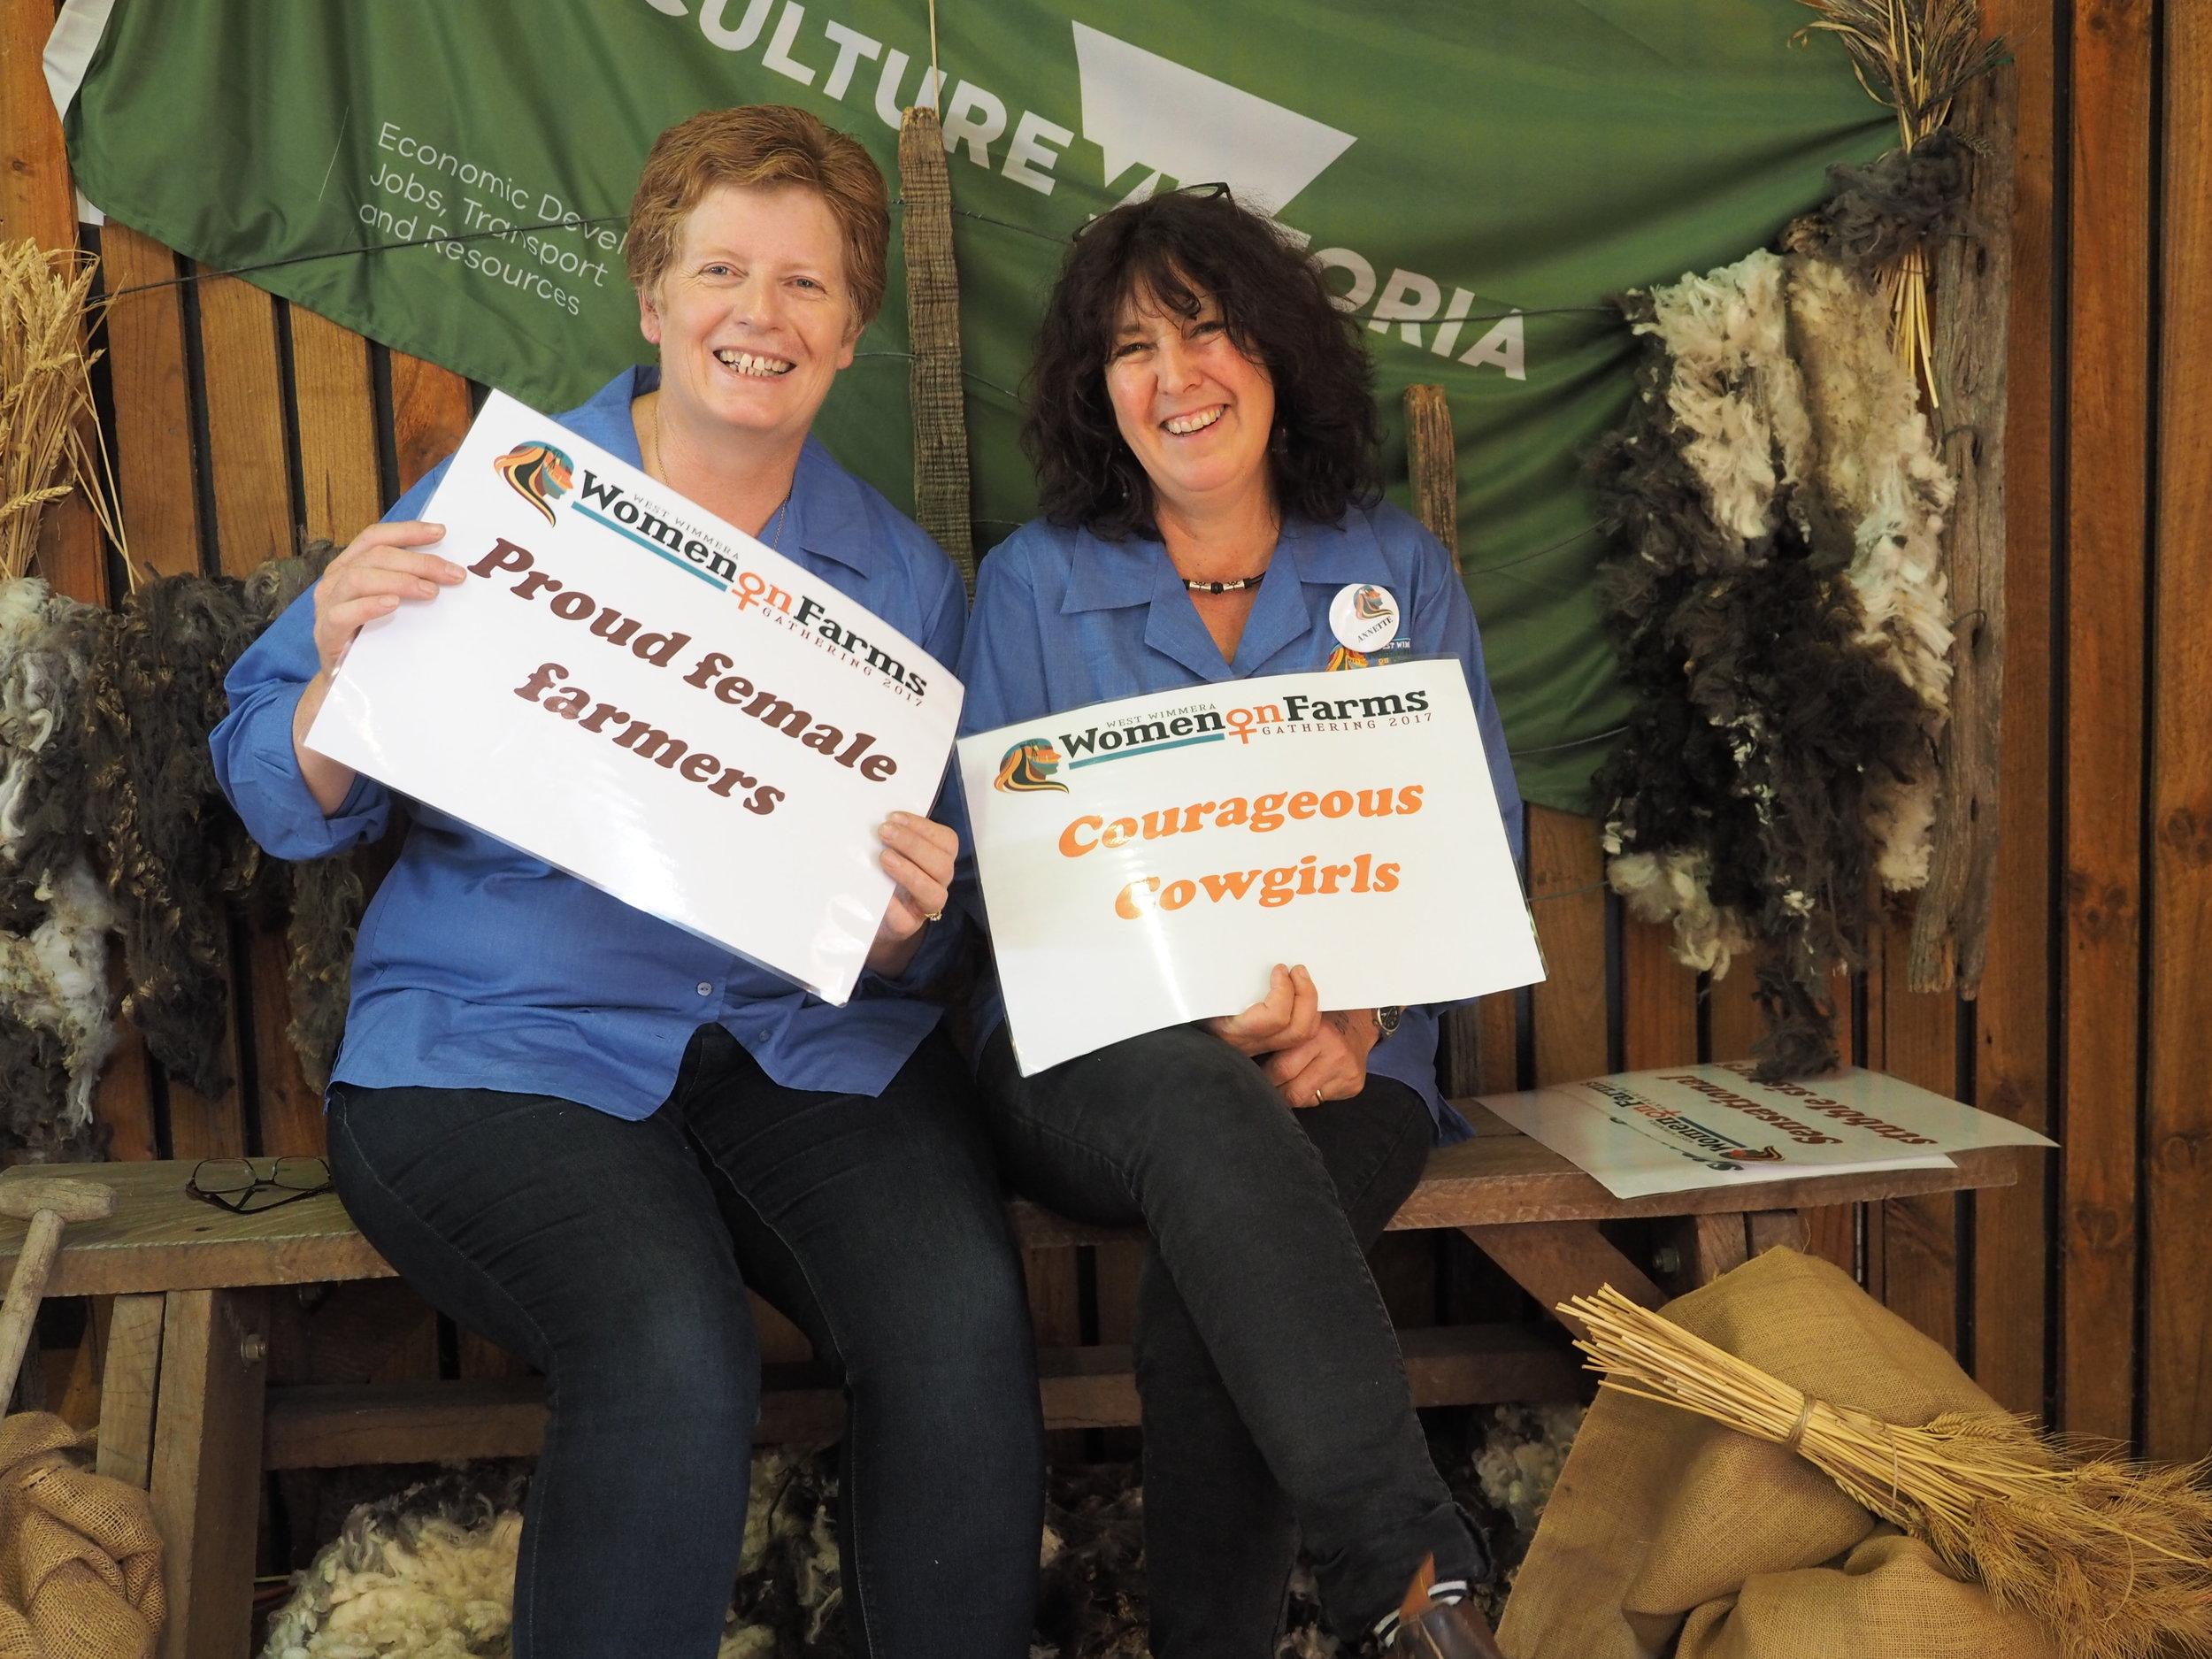 Harrow Women on Farms Gathering Committee Members Fiona Cameron and Annette Jones, Harrow, 2017